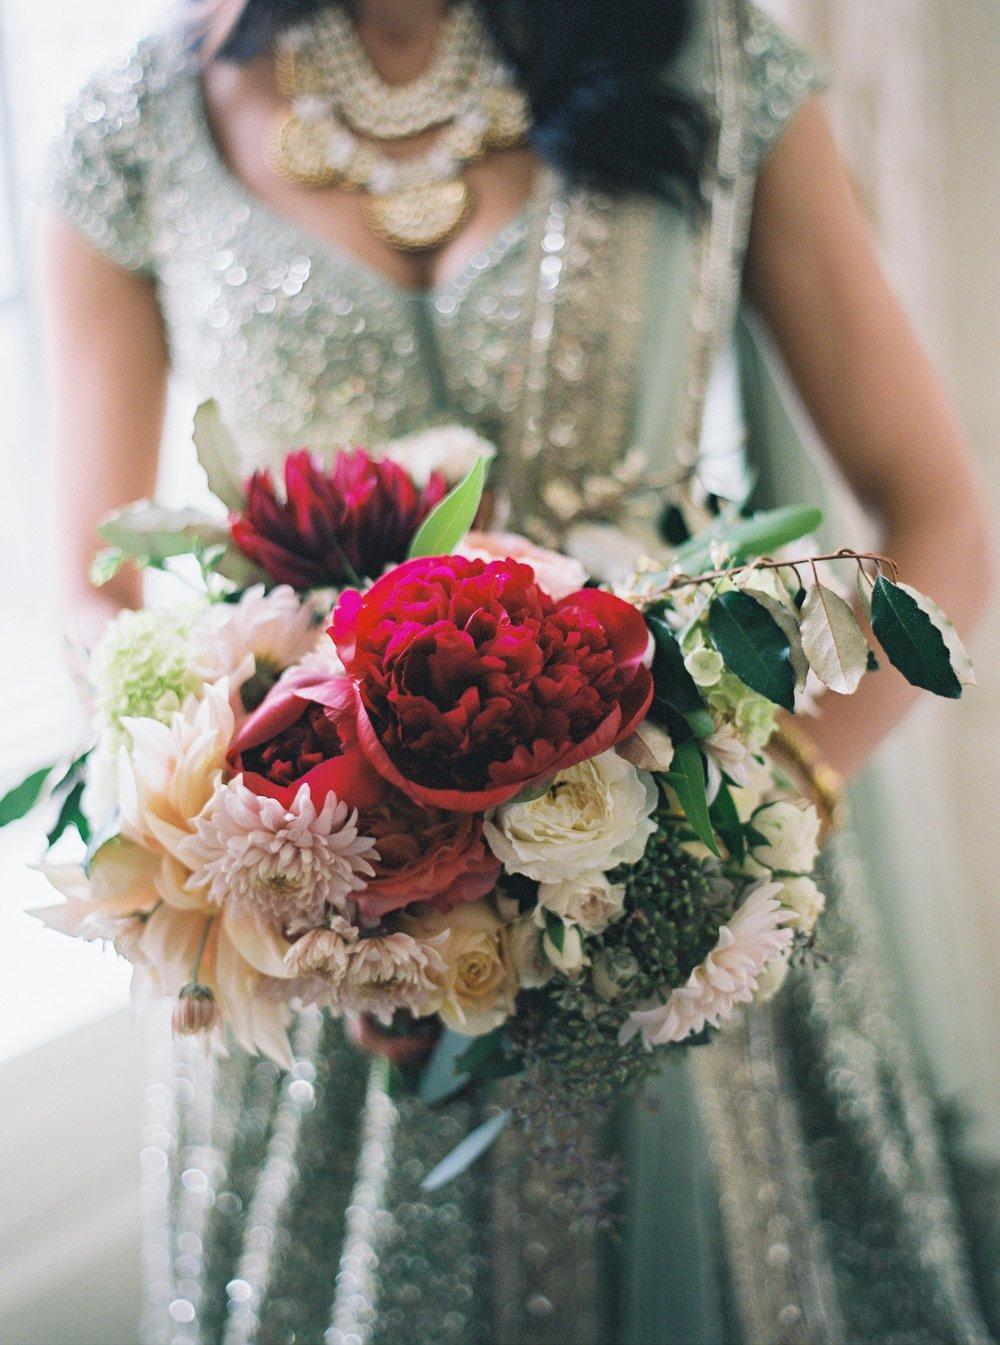 khurana_wedding00170.jpg